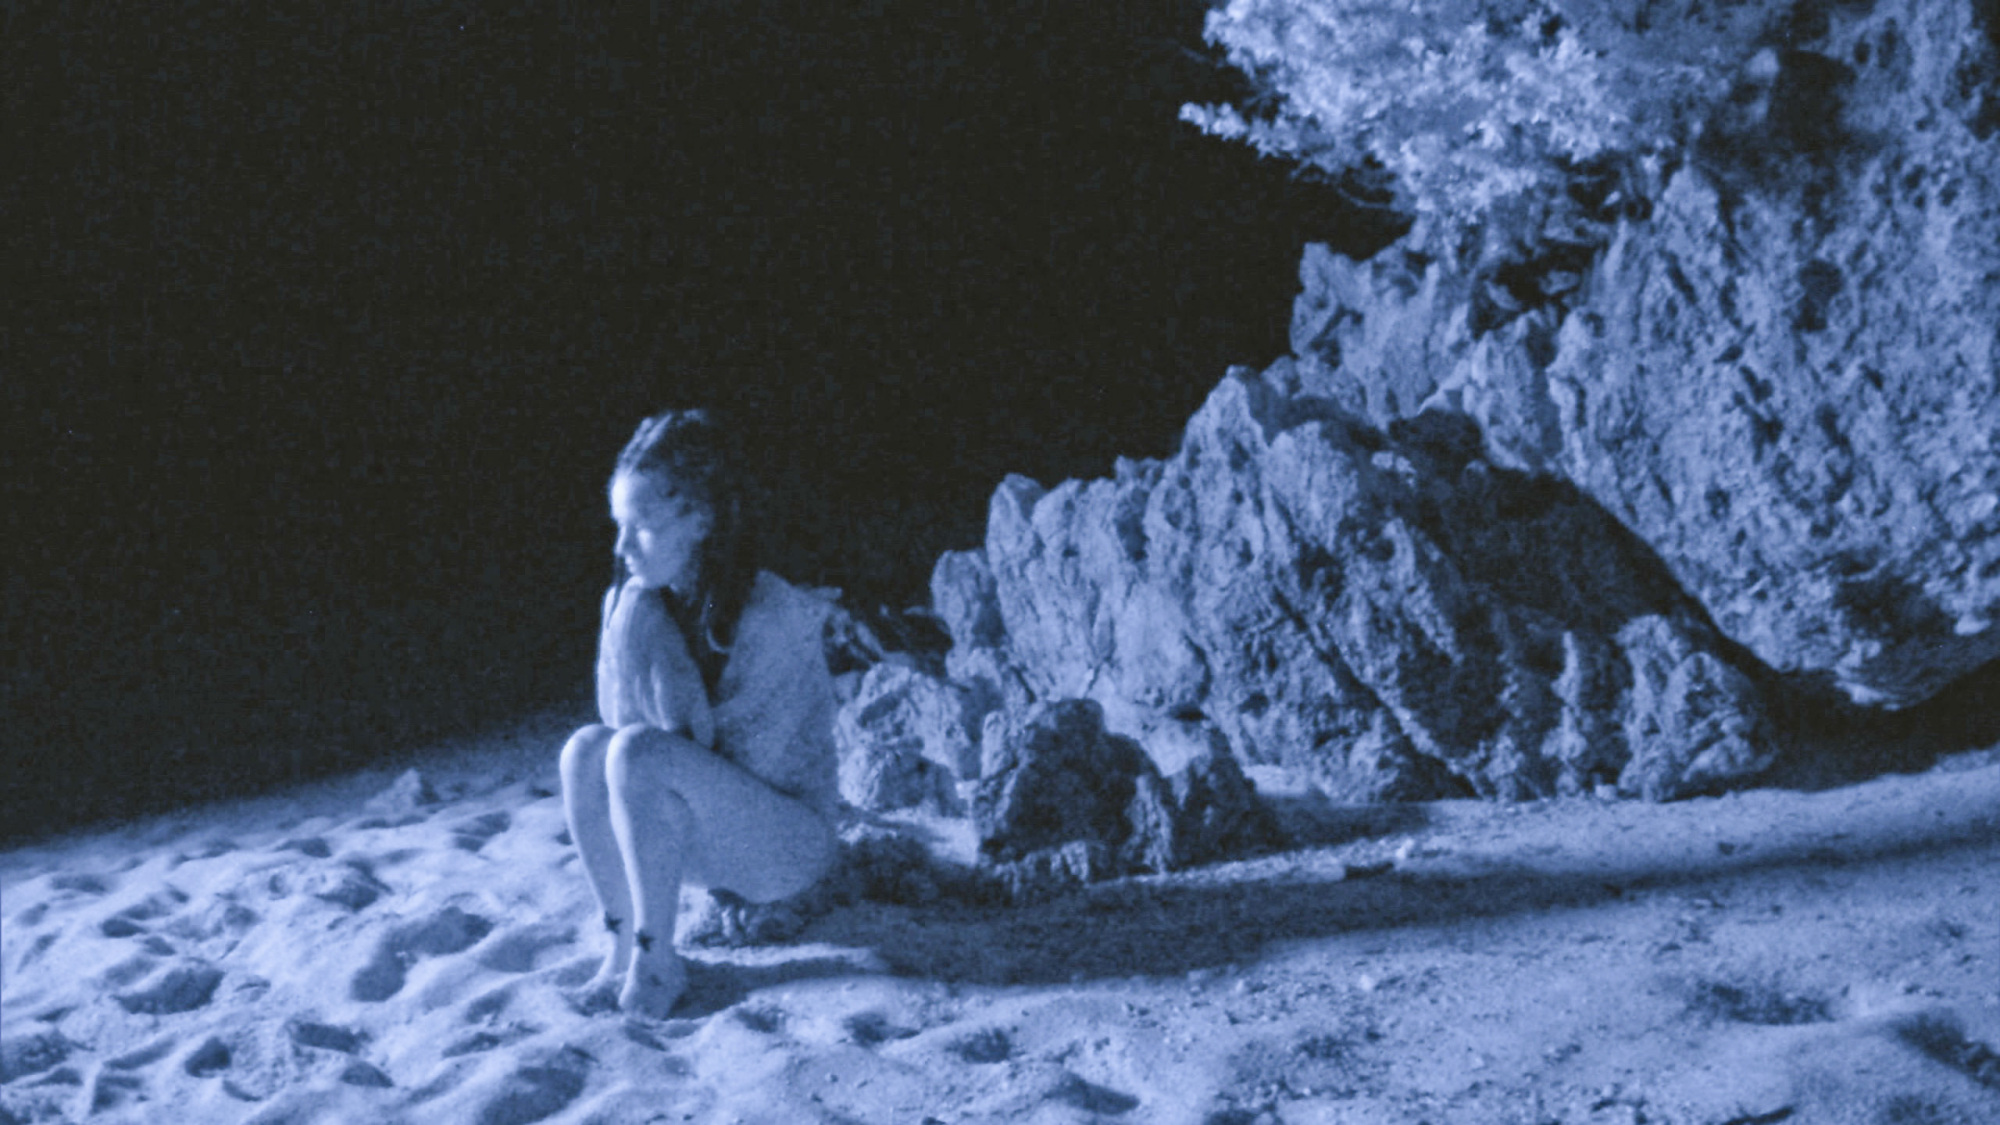 Lindsey in Season 28 Episode 5